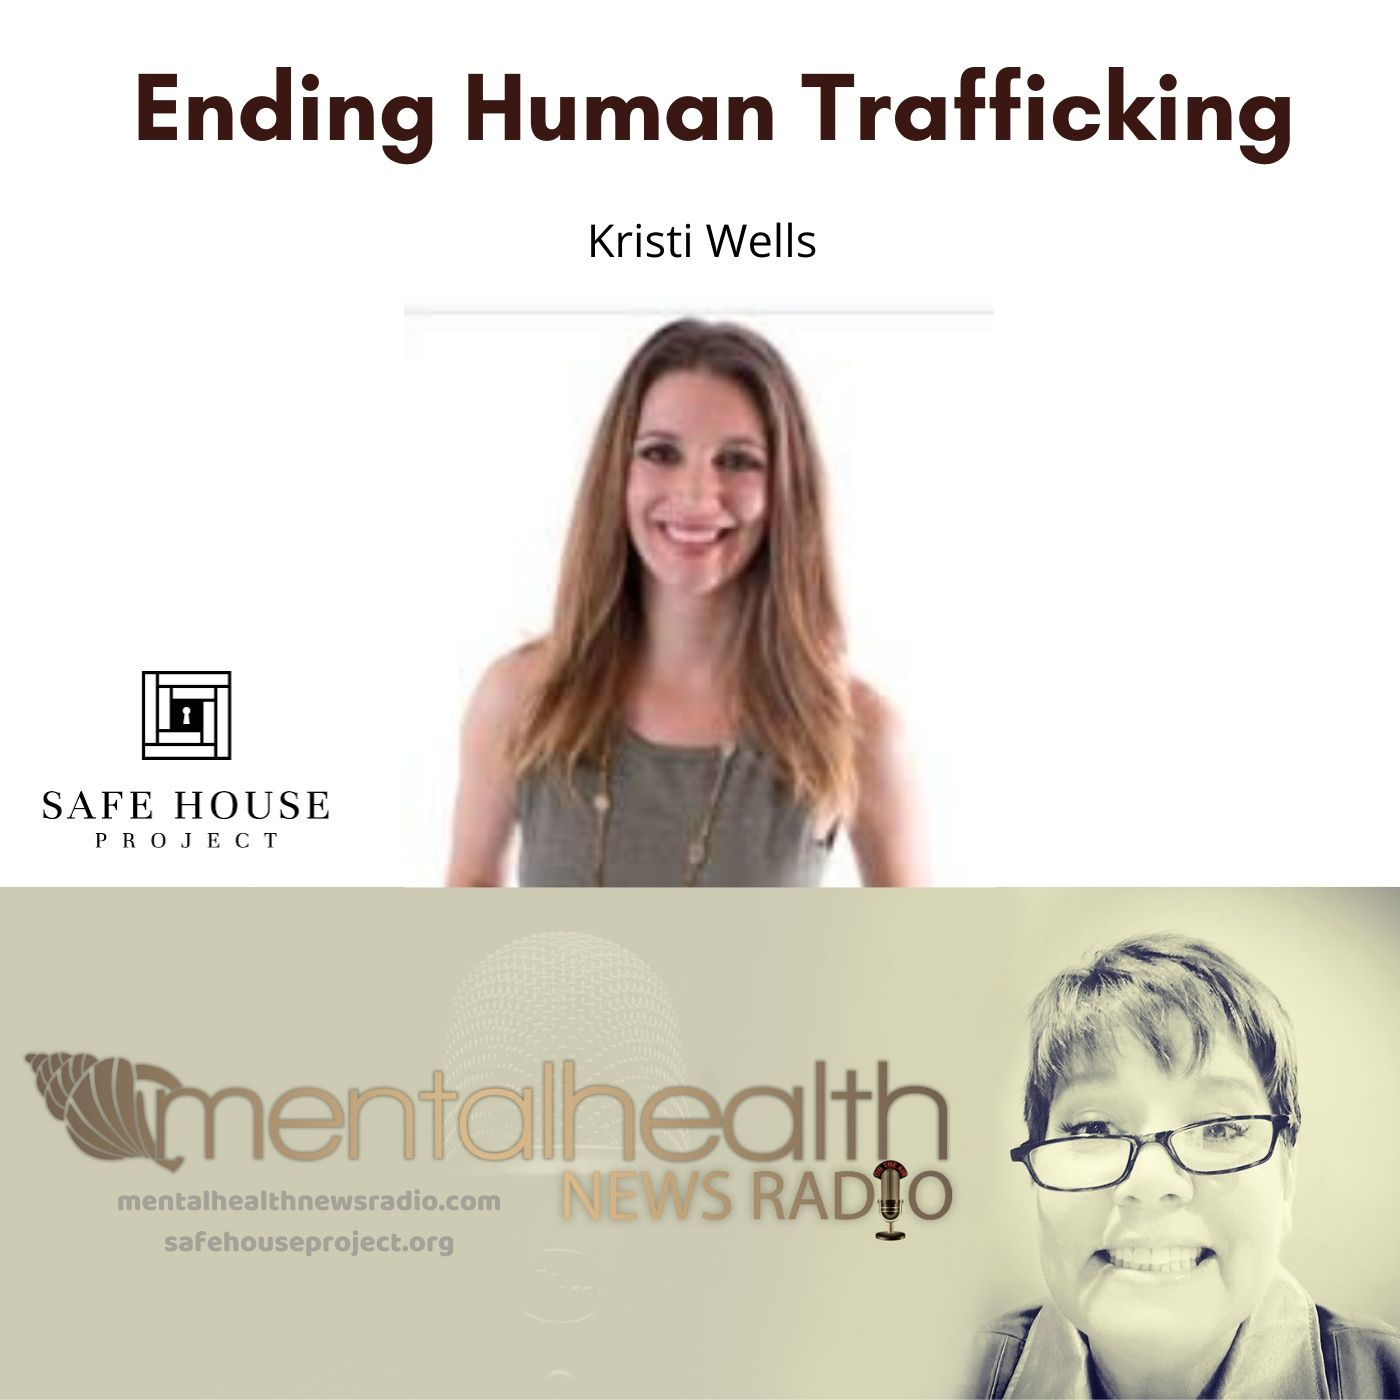 Mental Health News Radio - Ending Human Trafficking with Kristi Wells